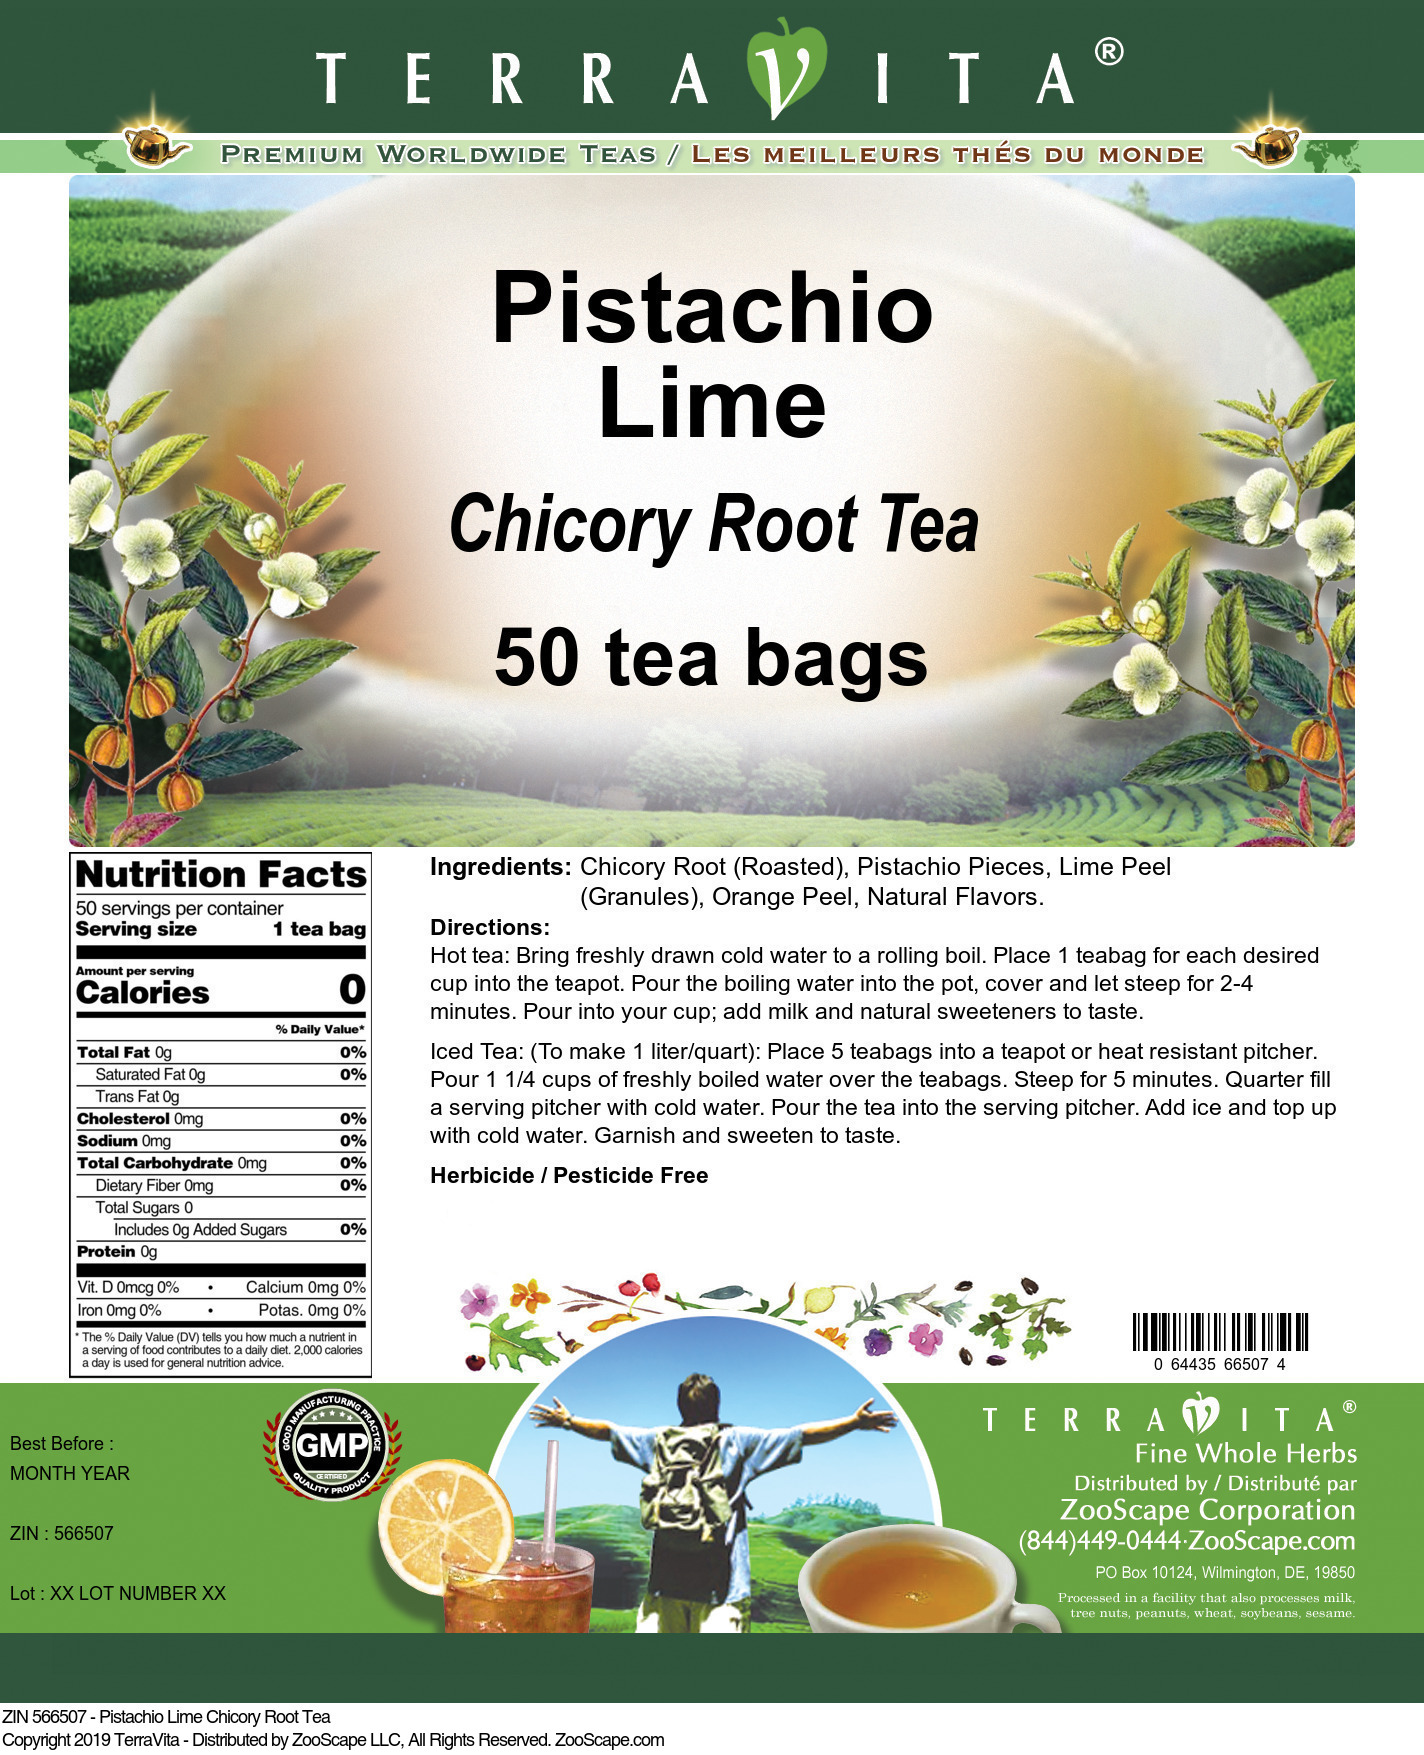 Pistachio Lime Chicory Root Tea